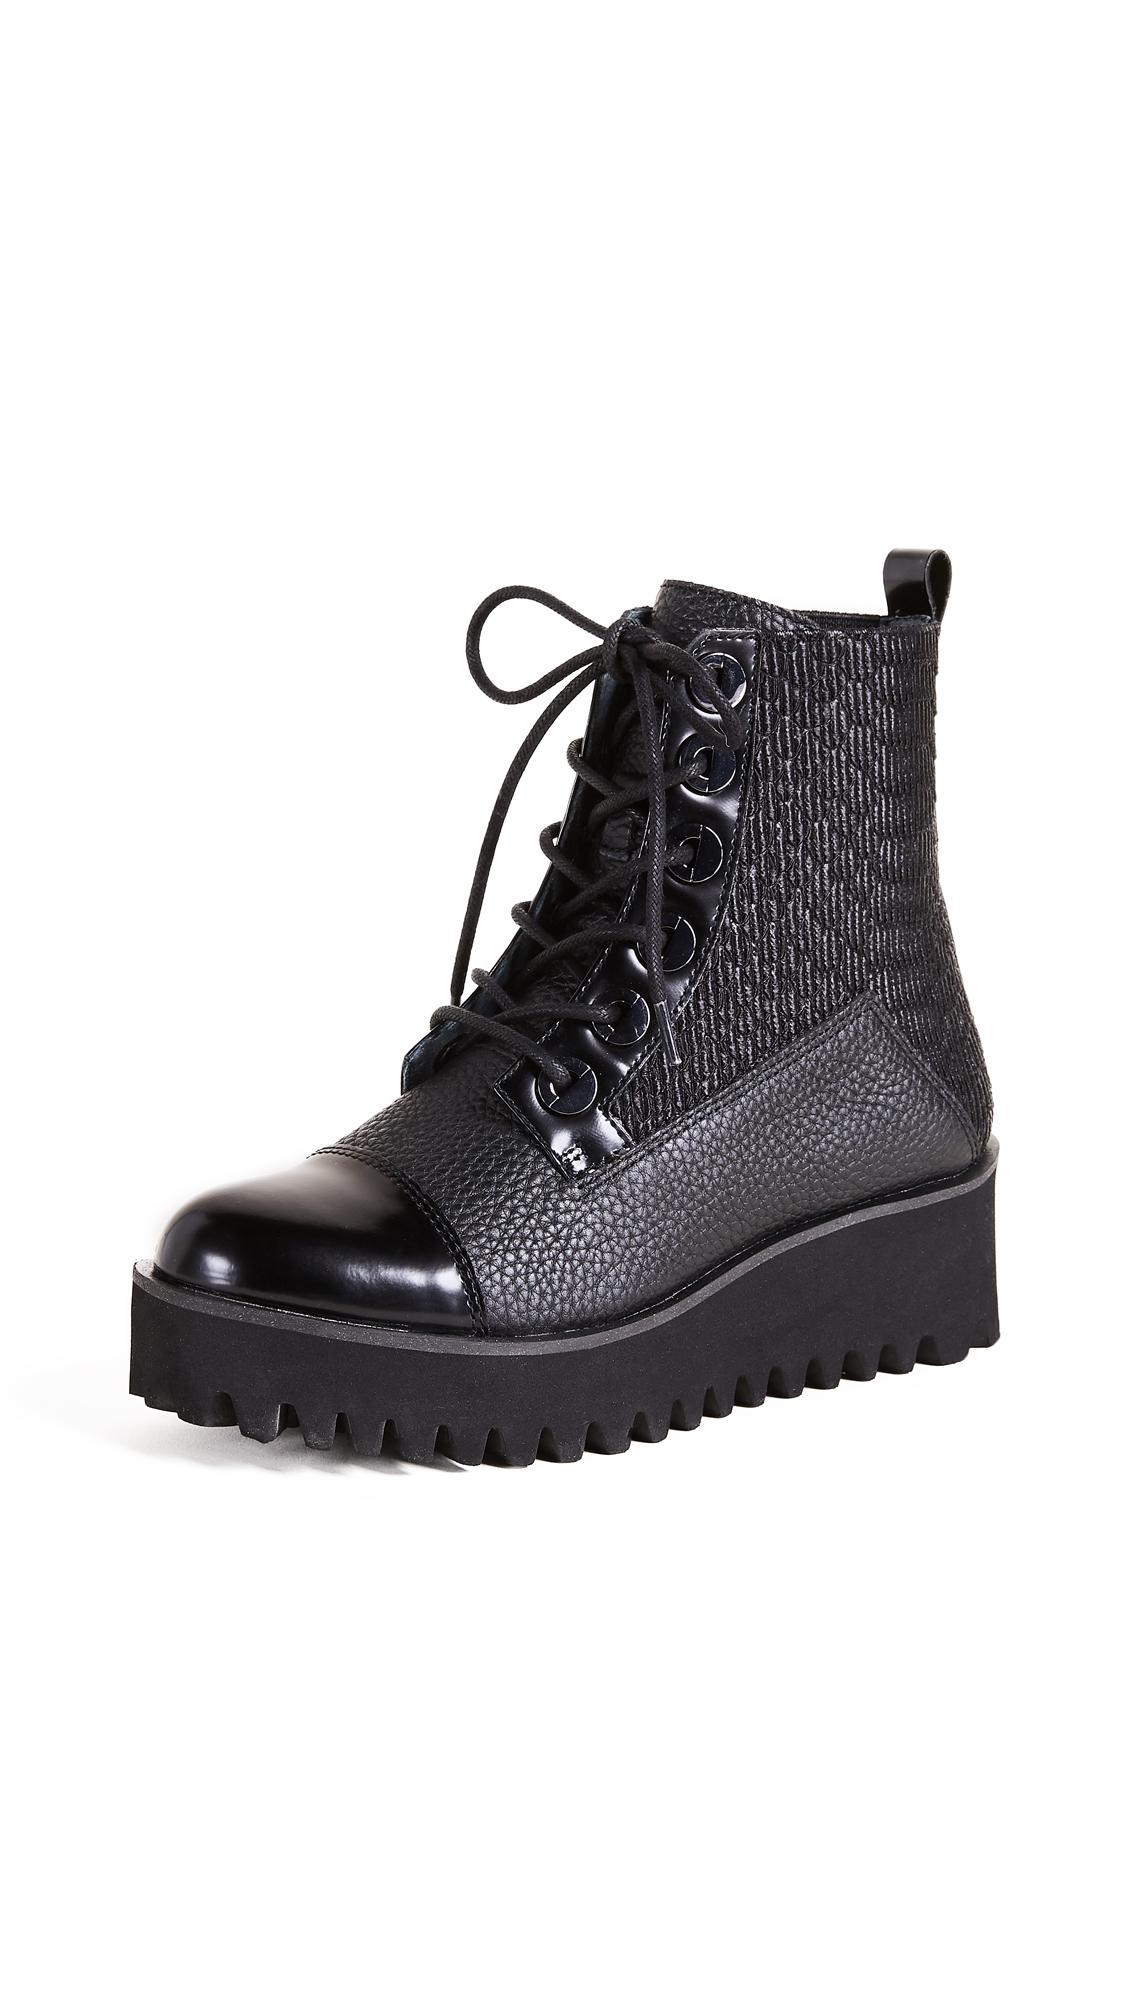 United Nude Combat Platform Boots - Black/Black